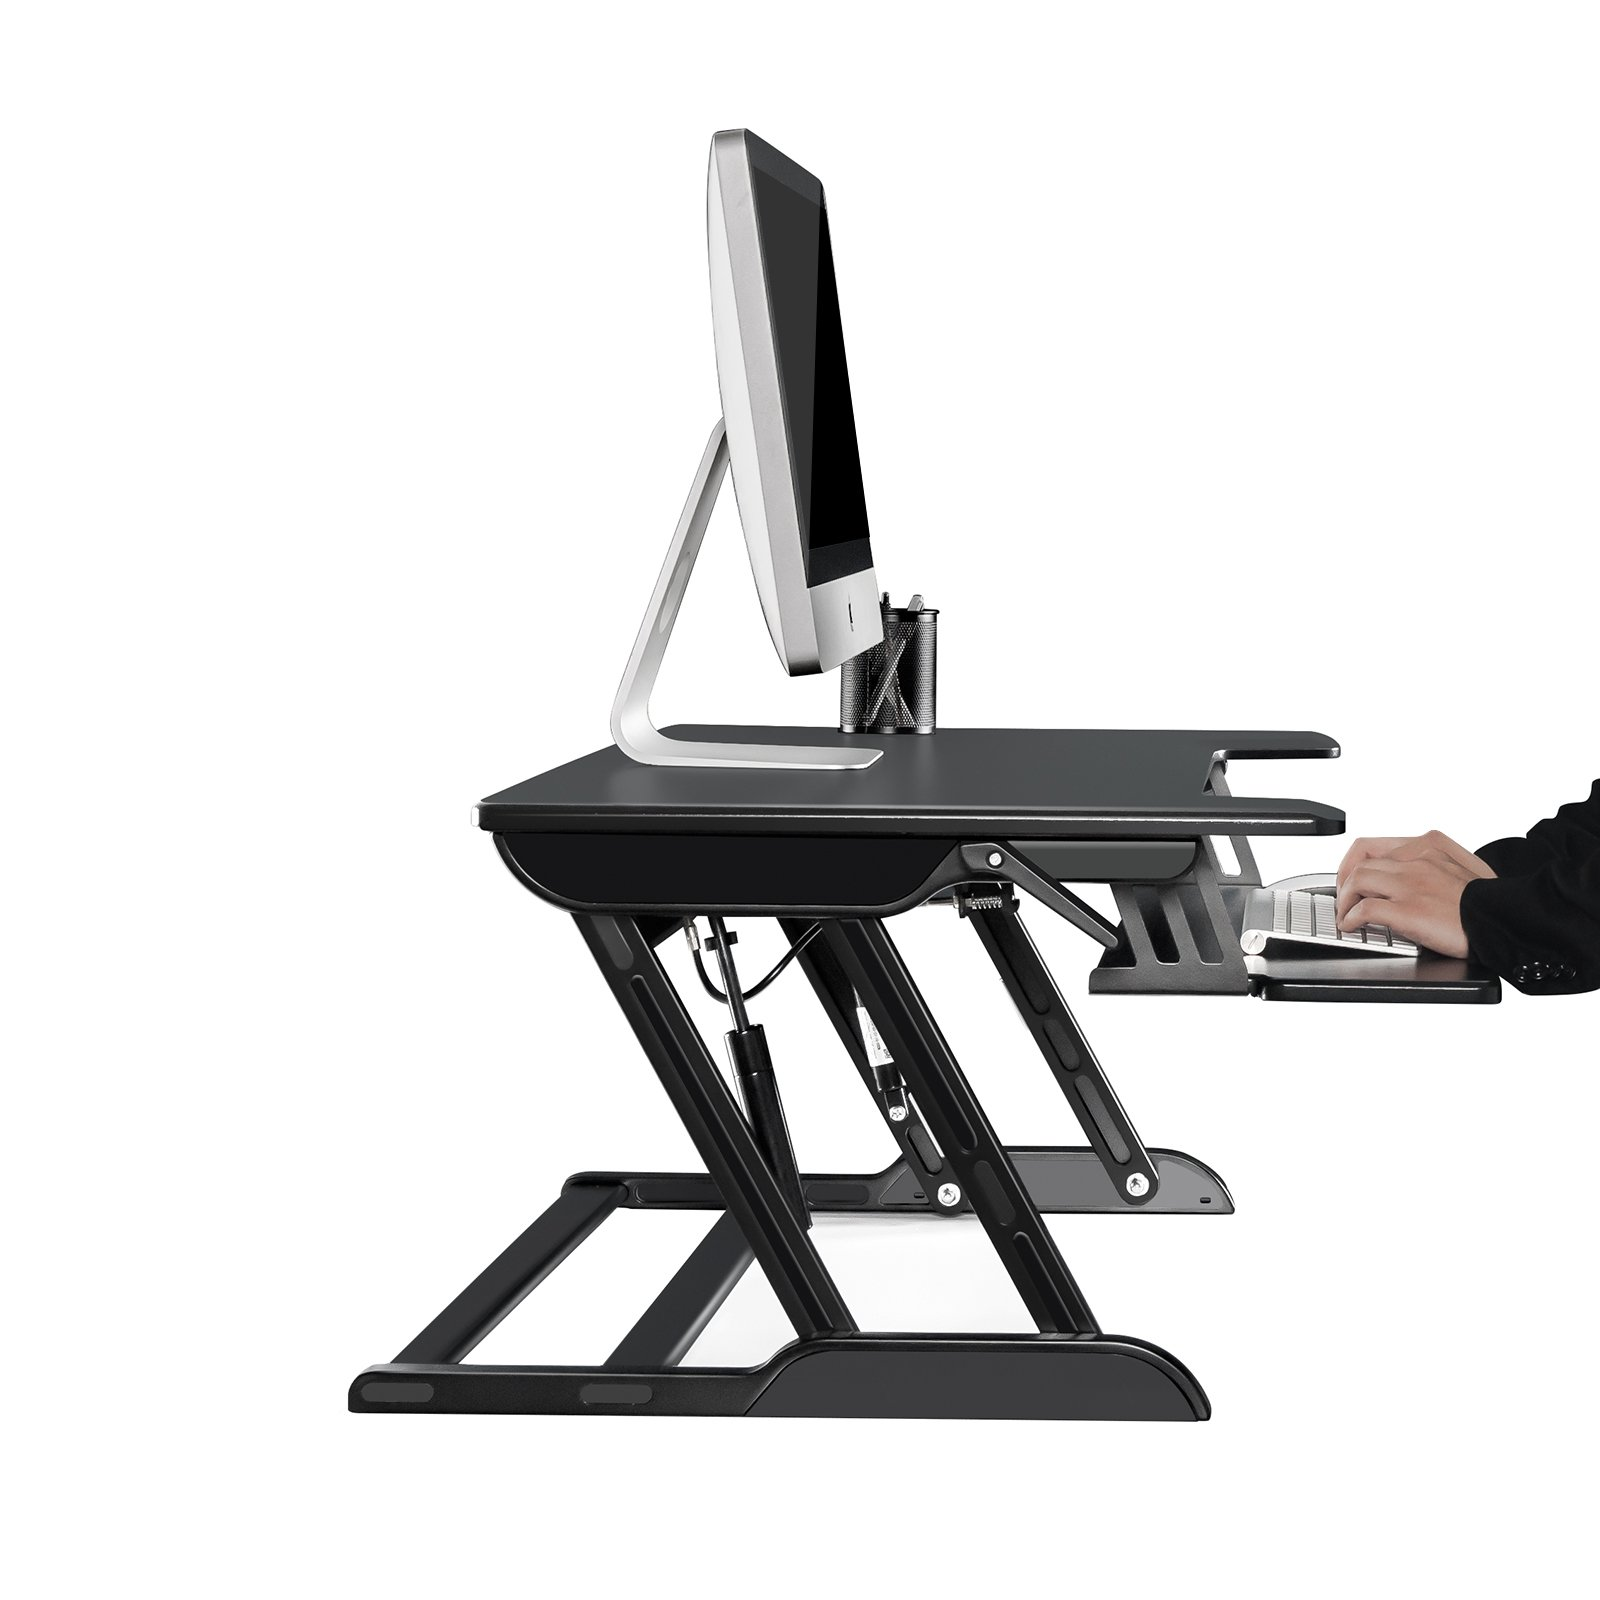 UPERGO 32'' Aluminum Frame Height Adjustable Standing Desk Raiser with Keyboard Tray, Black(ID-32B) by UPERGO